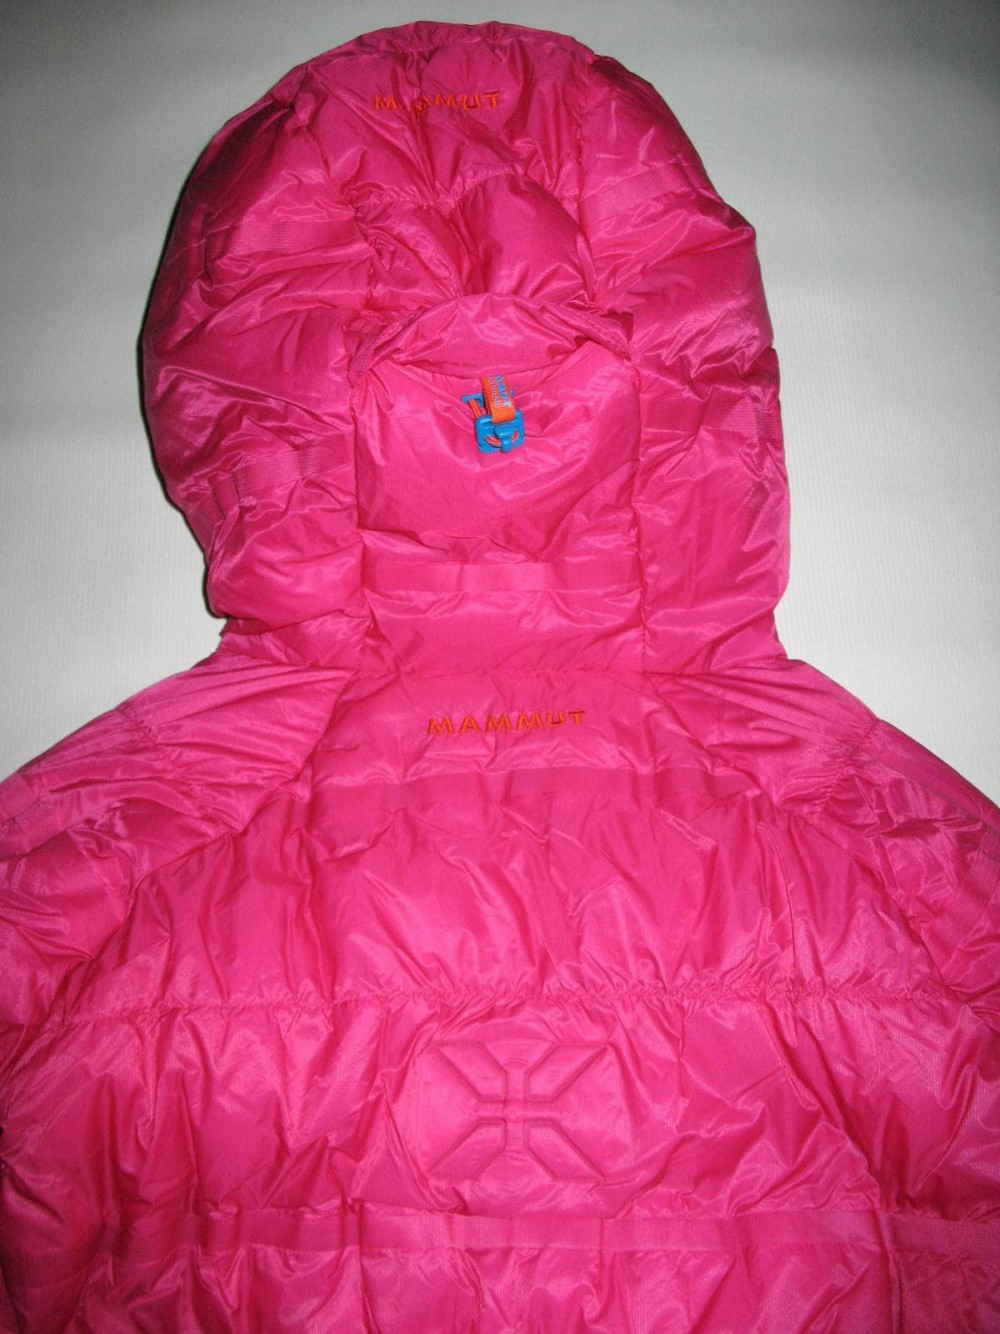 Куртка MAMMUT biwak eiger extreme jacket lady (размер S/M) - 9